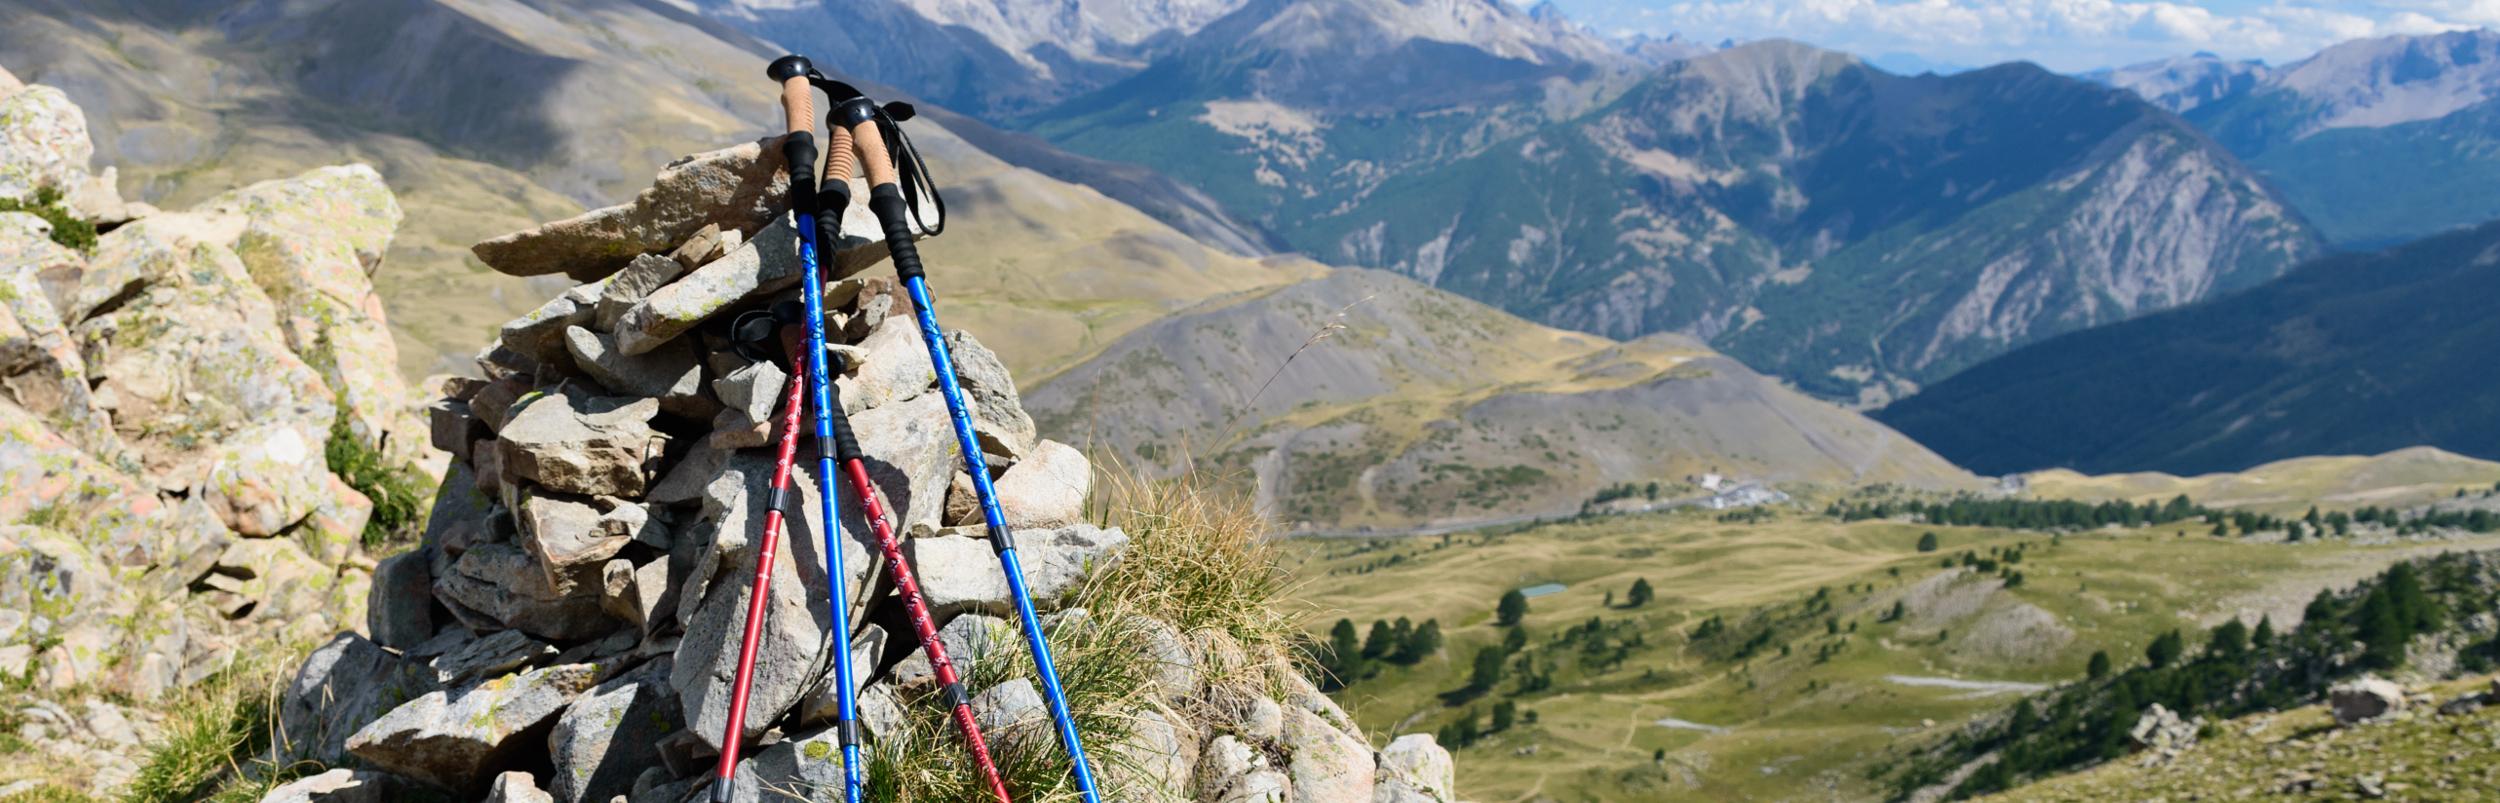 Hiking sticks and trekking poles